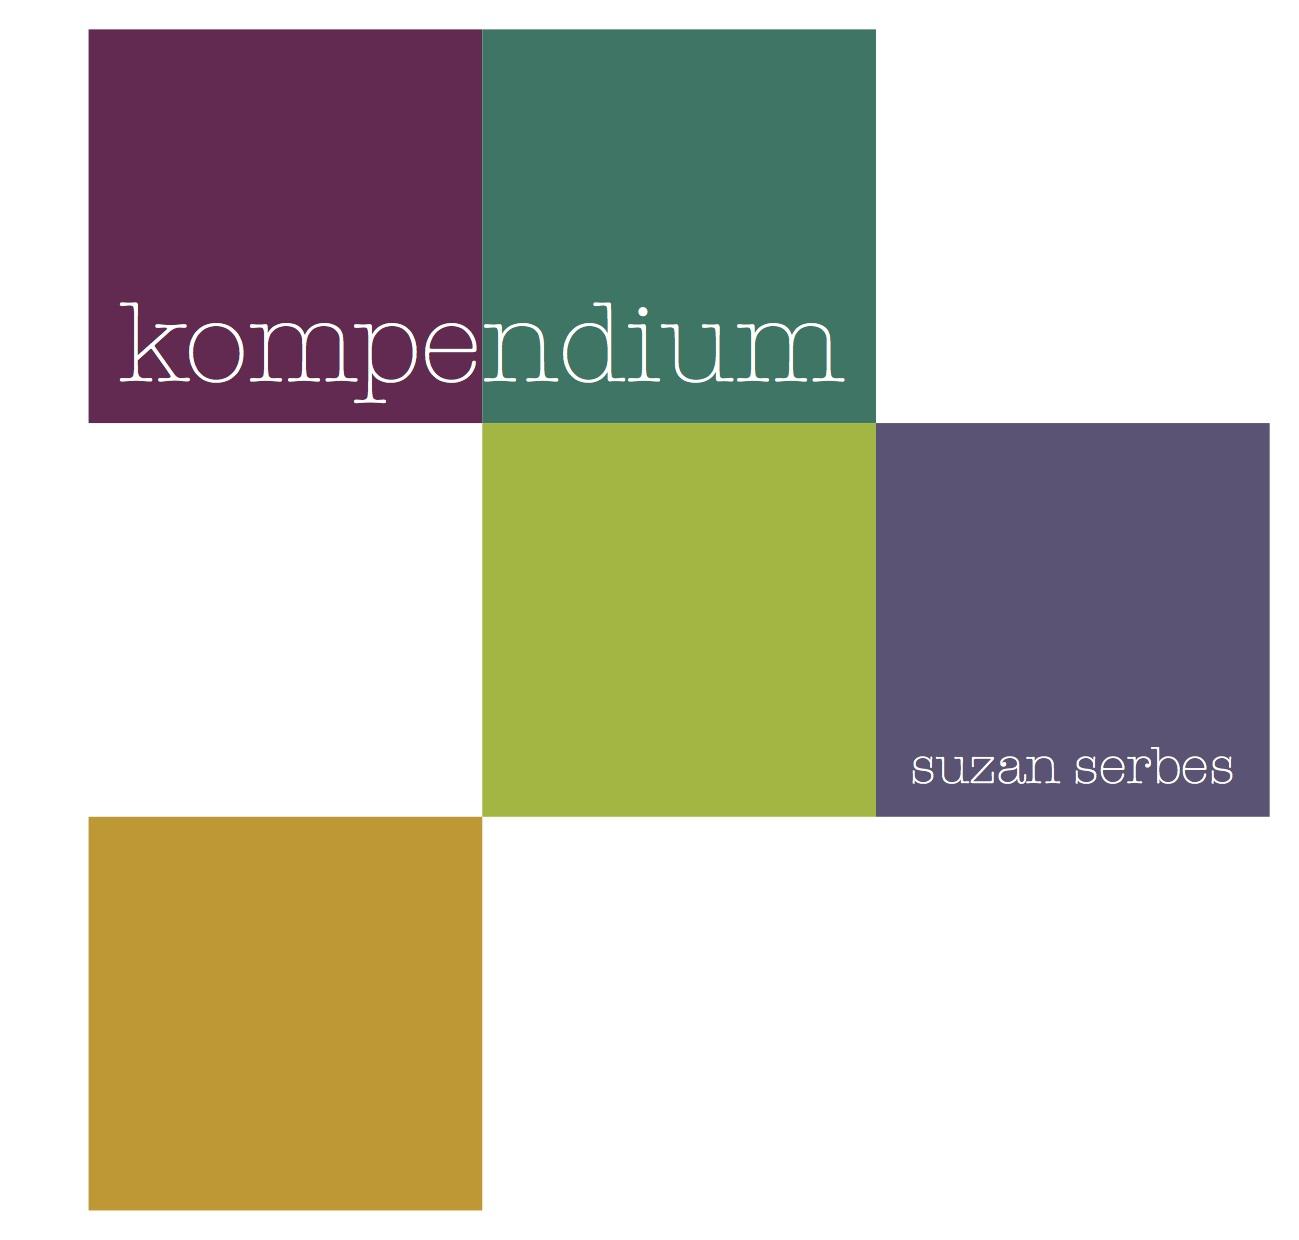 Kompendium_SuzanSerbes_01